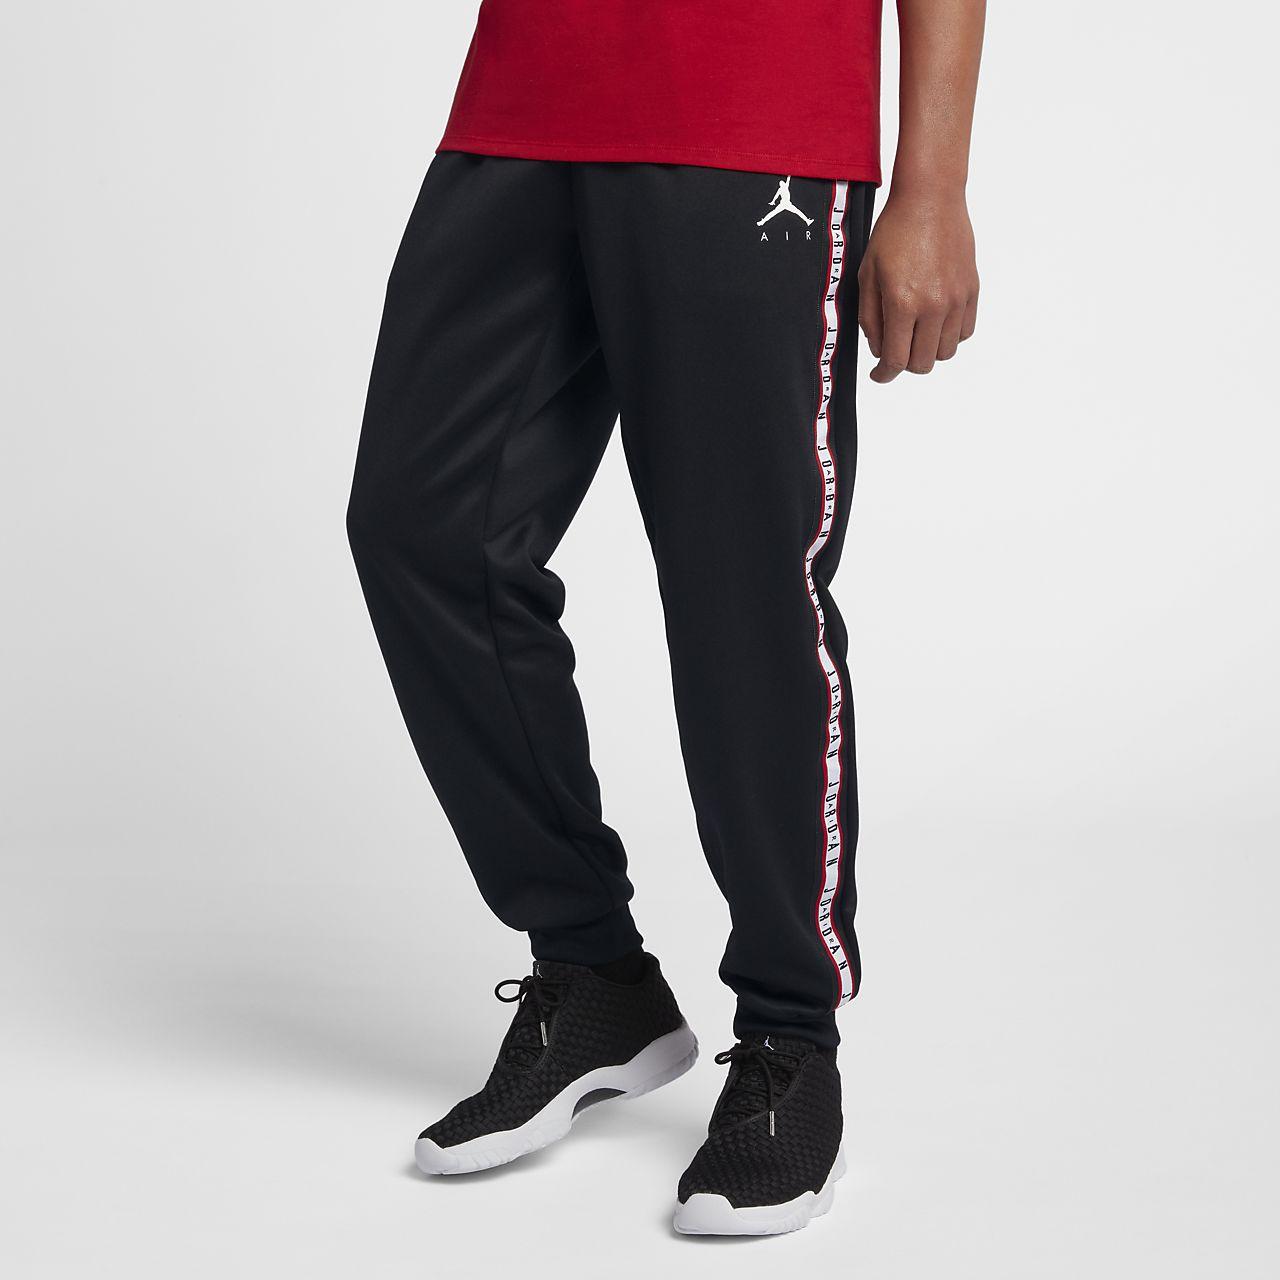 60b556e7c4be97 Low Resolution Jordan Lifestyle Jumpman Men s Trousers Jordan Lifestyle  Jumpman Men s Trousers